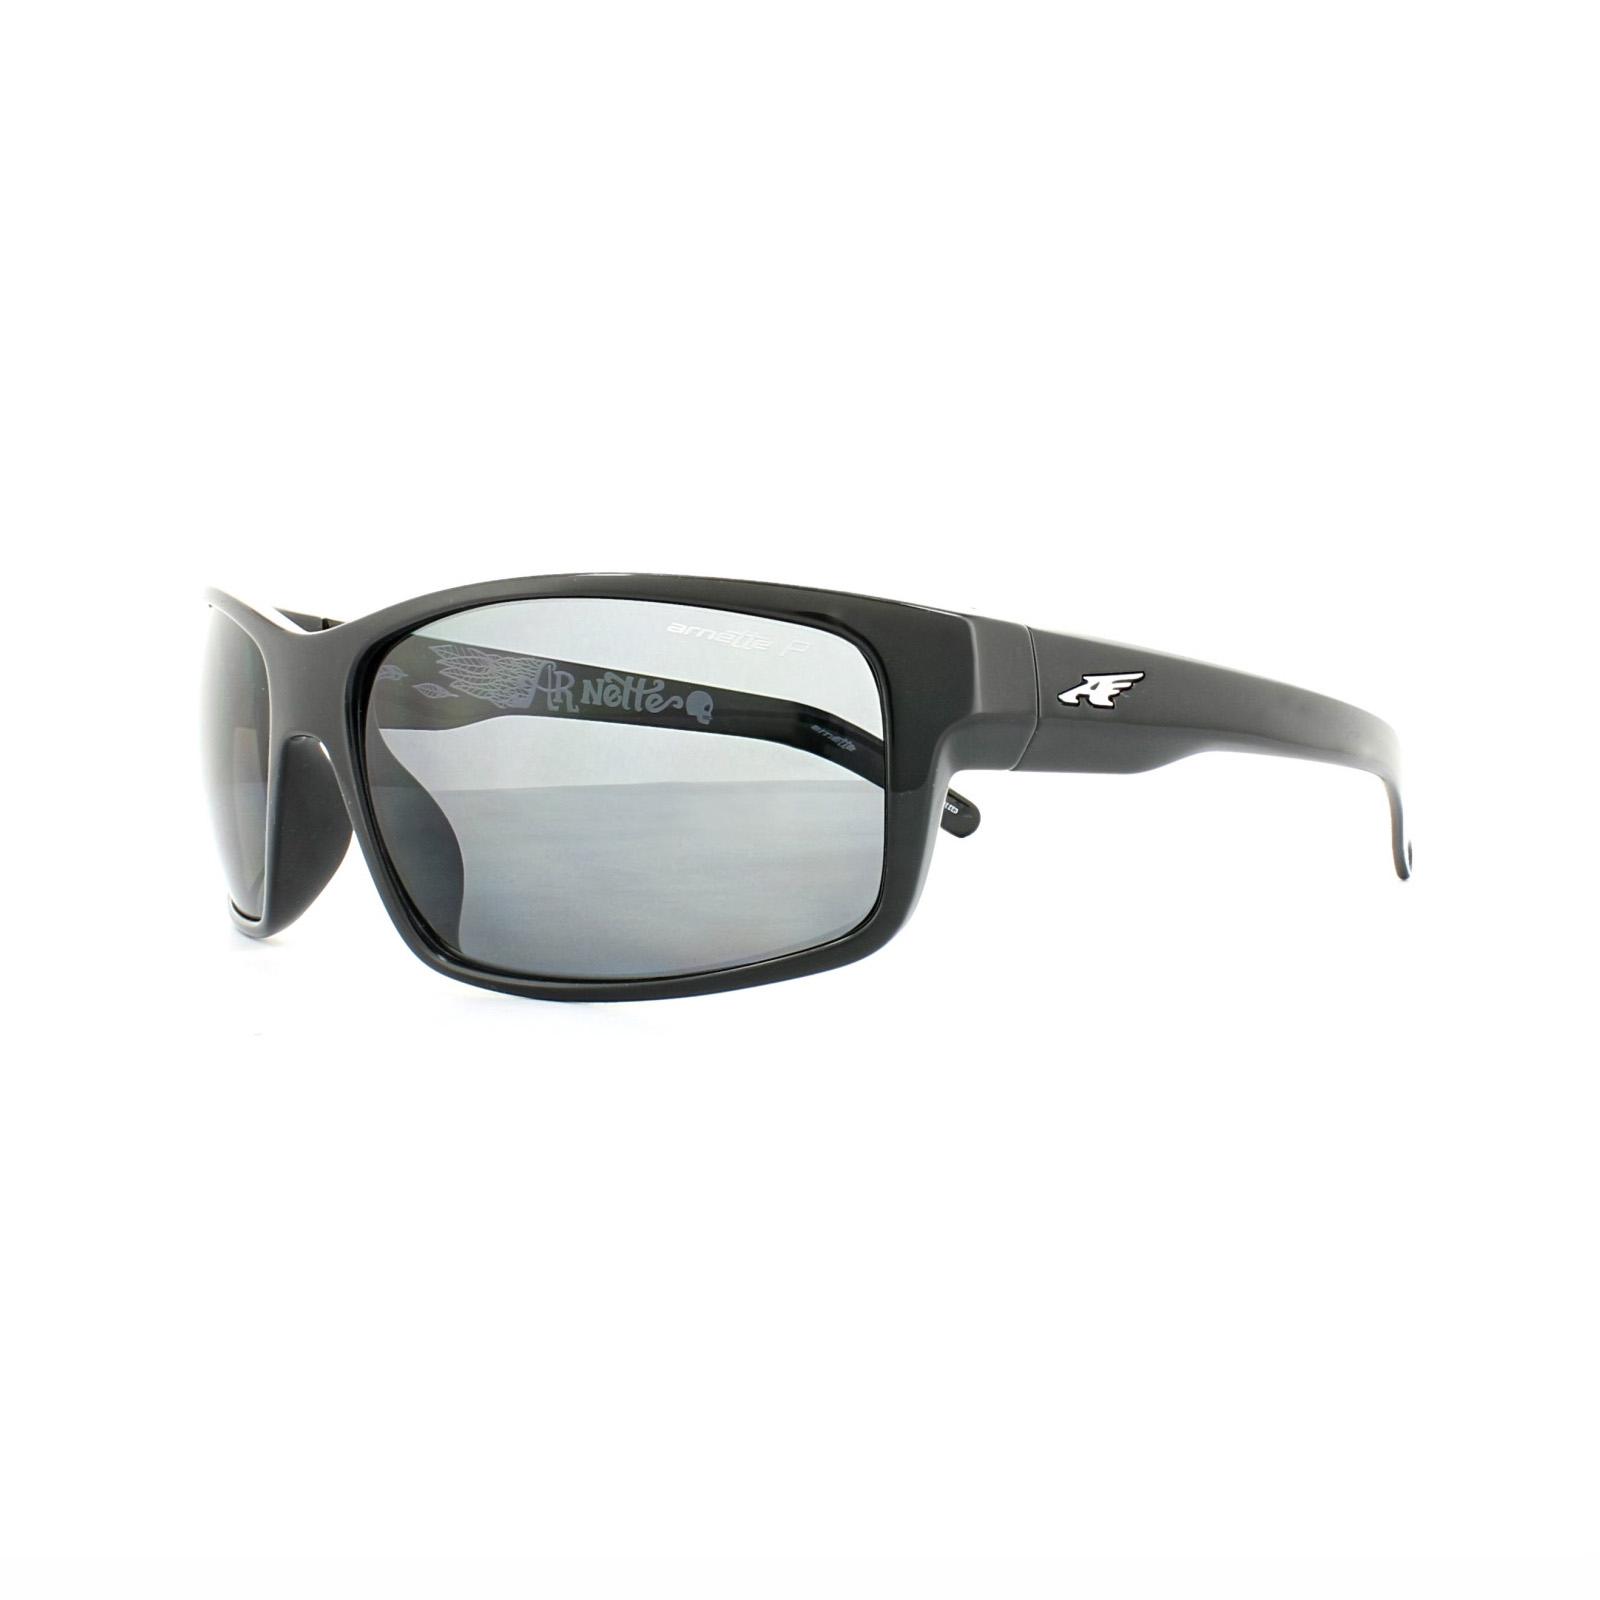 63e21c3cf1caa Oculos Arnette Glory Daze Preço – Southern California Weather Force